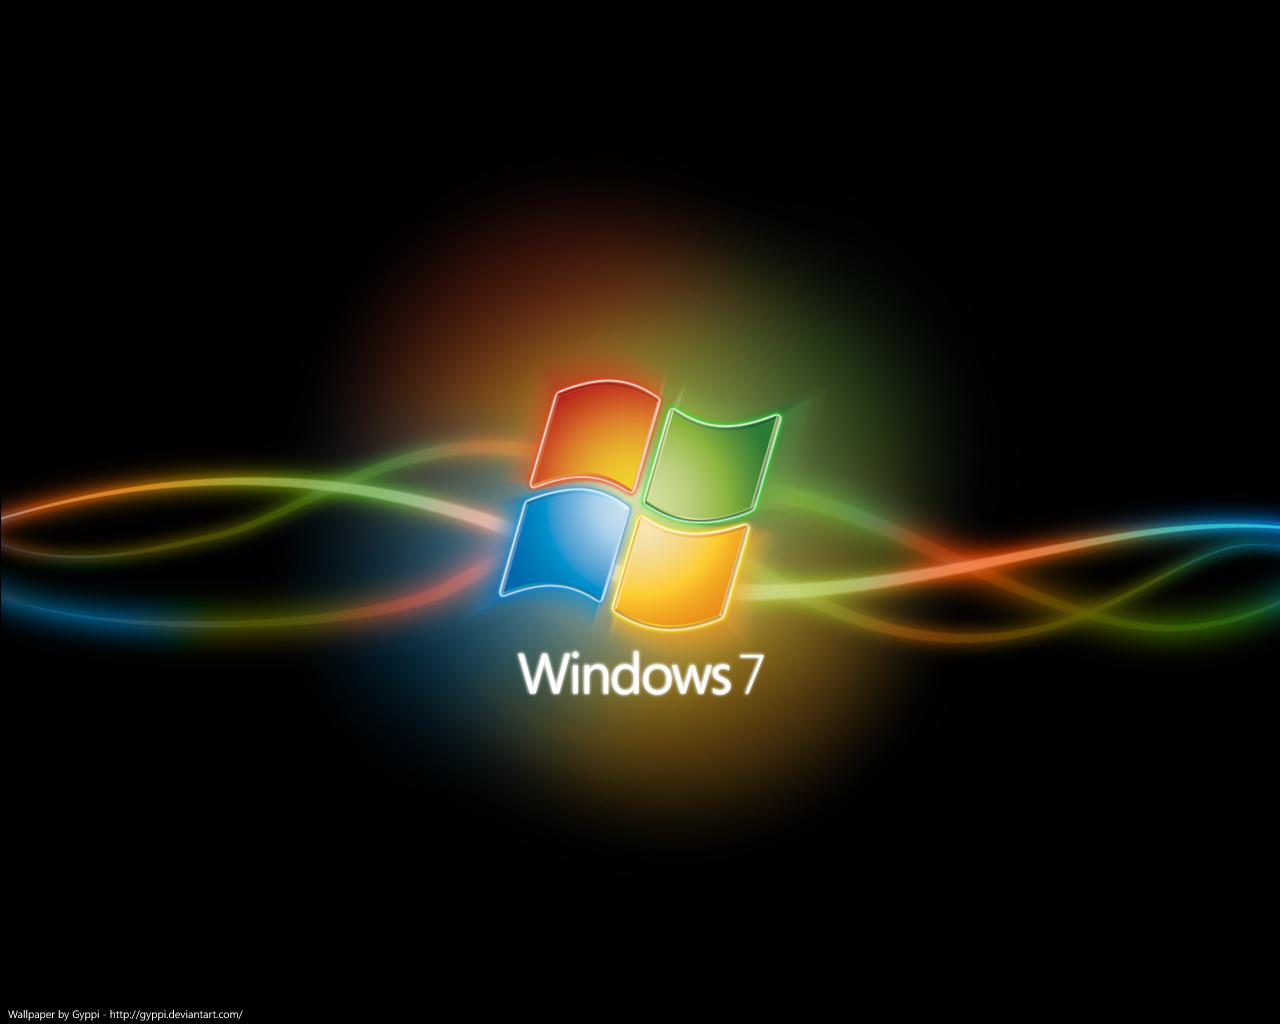 http://4.bp.blogspot.com/_3G4dg-GWVKI/THuCEJgO8sI/AAAAAAAAHTM/qY7wntCLpwE/s1600/Windows7+-+(5.4)+%40+1280x1024.jpg